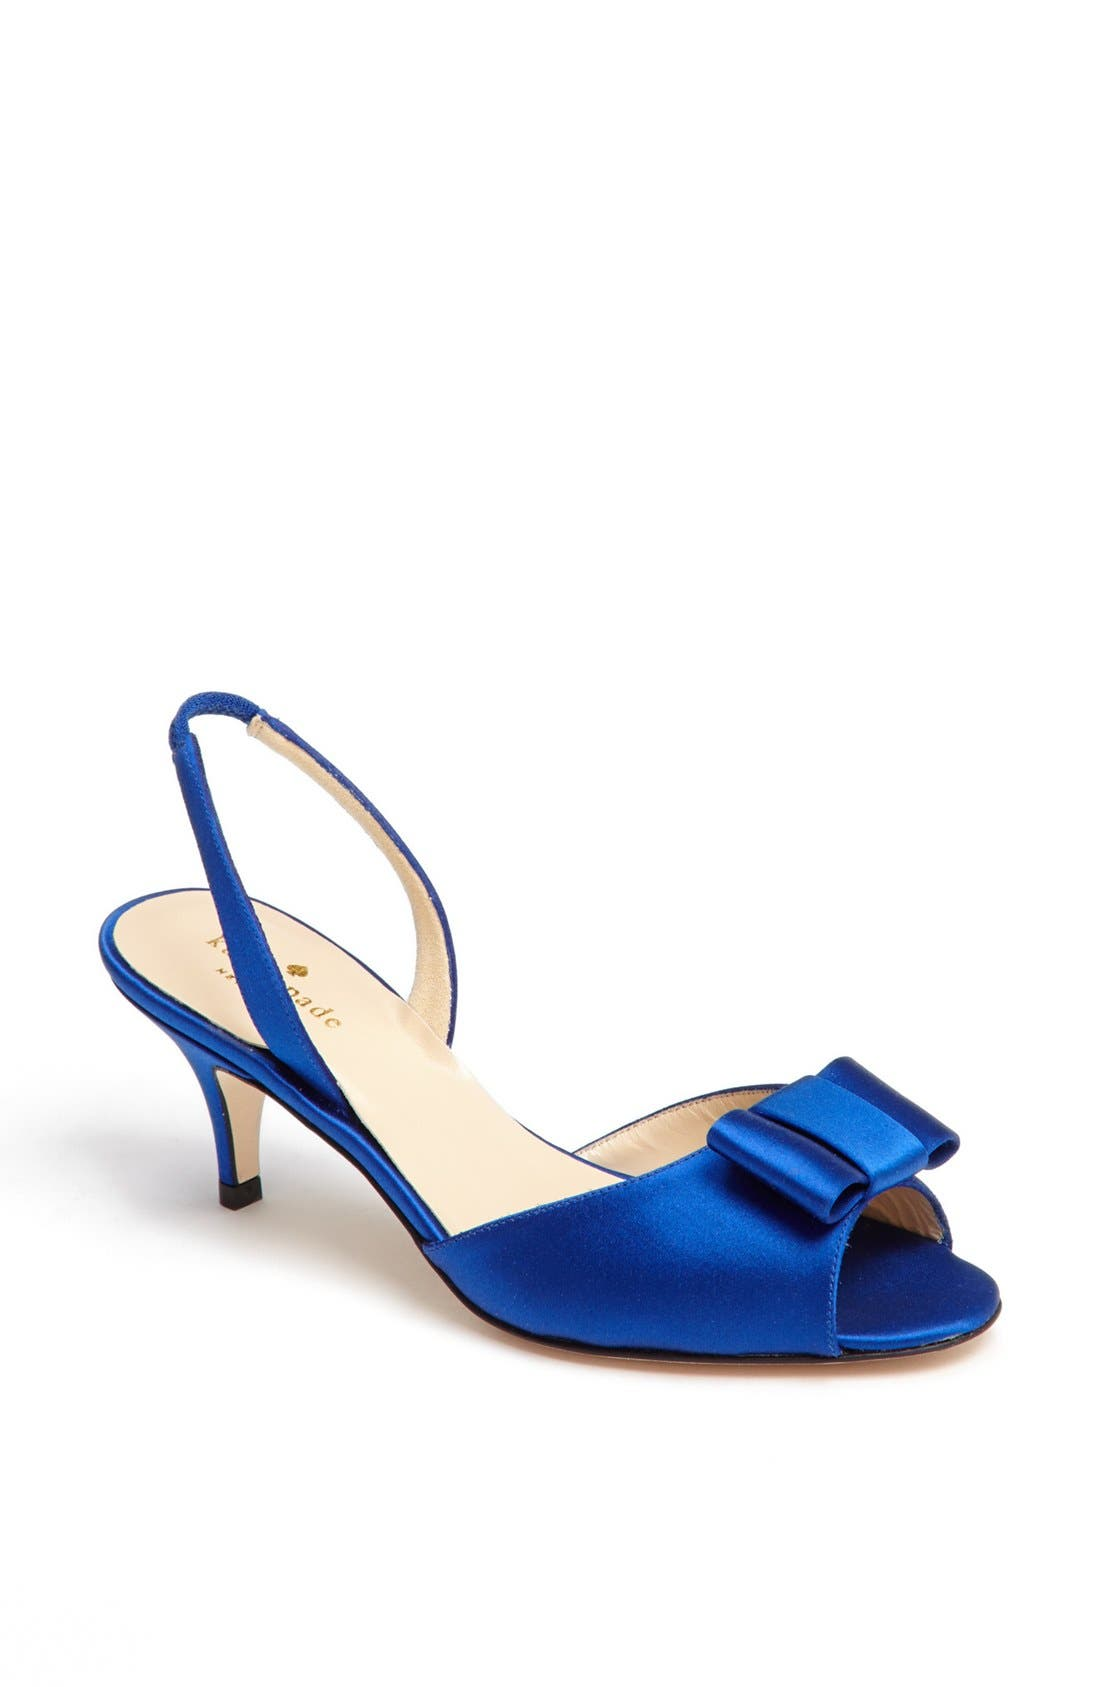 Main Image - kate spade new york 'emelia' sandal (Women)